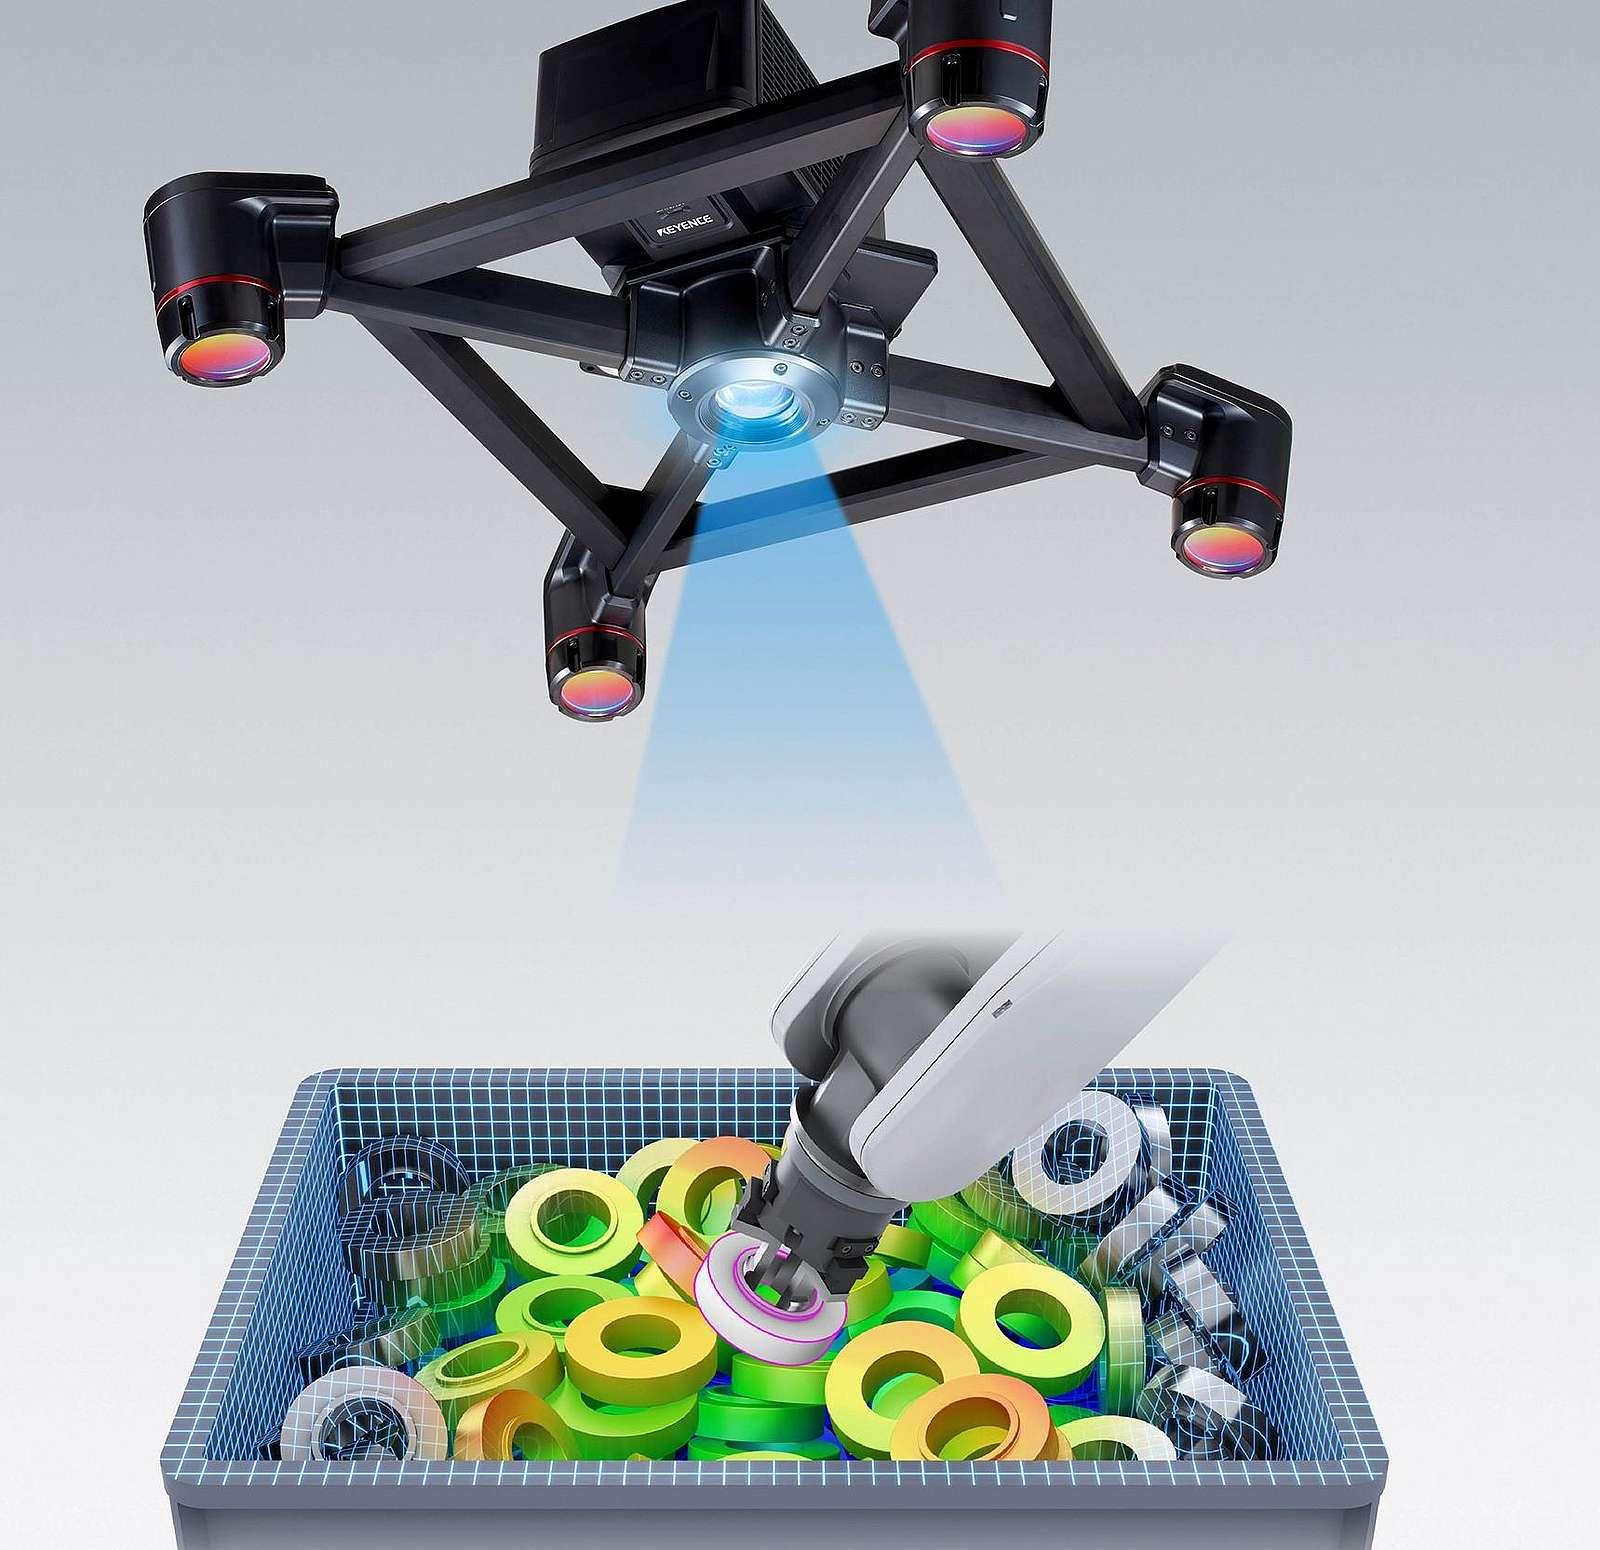 Source: Keyence 3D Robot Vision CV-480D